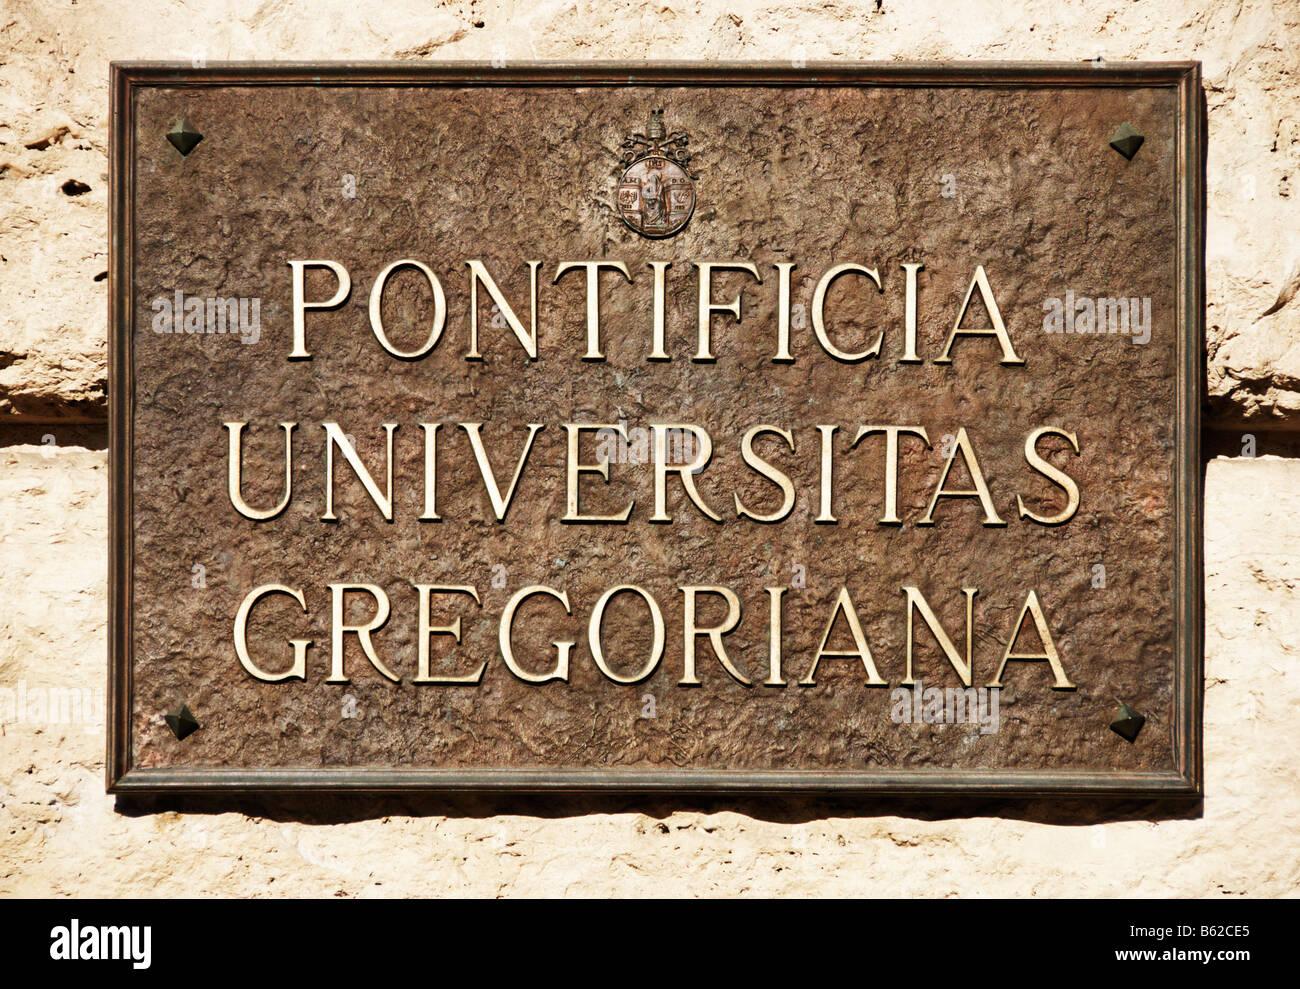 gregoriana in rome italy - photo#46